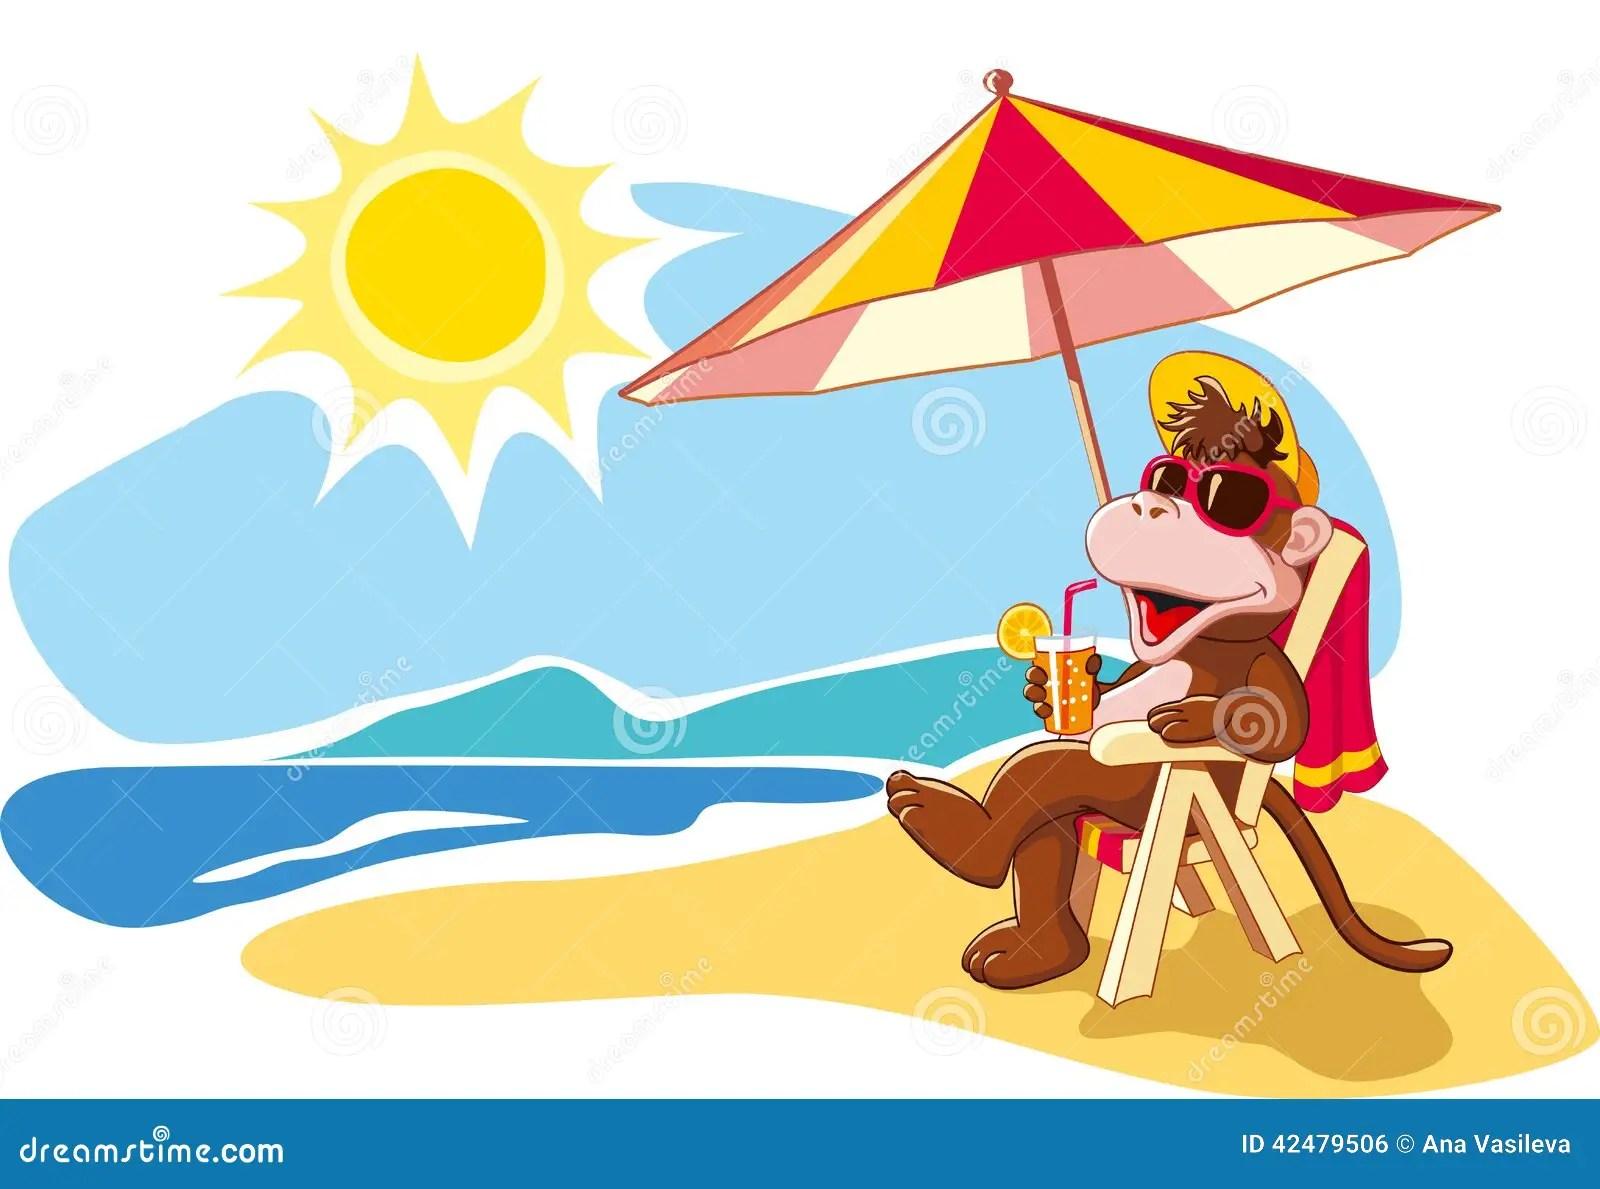 Summer Vacation By The Sea Cartoon Illustration Stock Vector Illustration Of Illustration Landscape 42479506